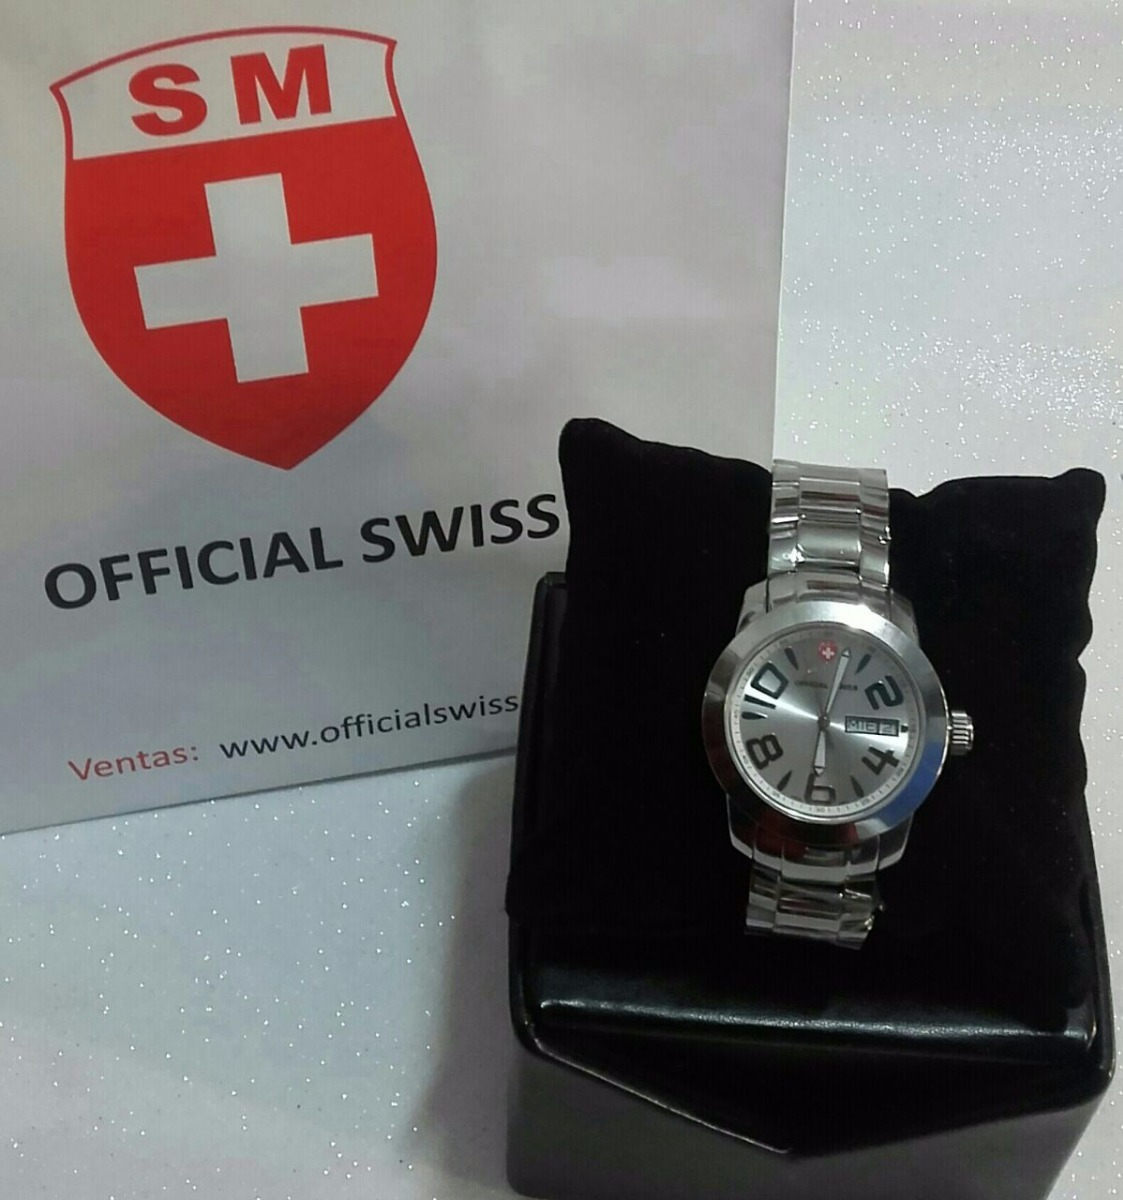 65c8908fd2dd reloj official swiss® para hombre. Cargando zoom.